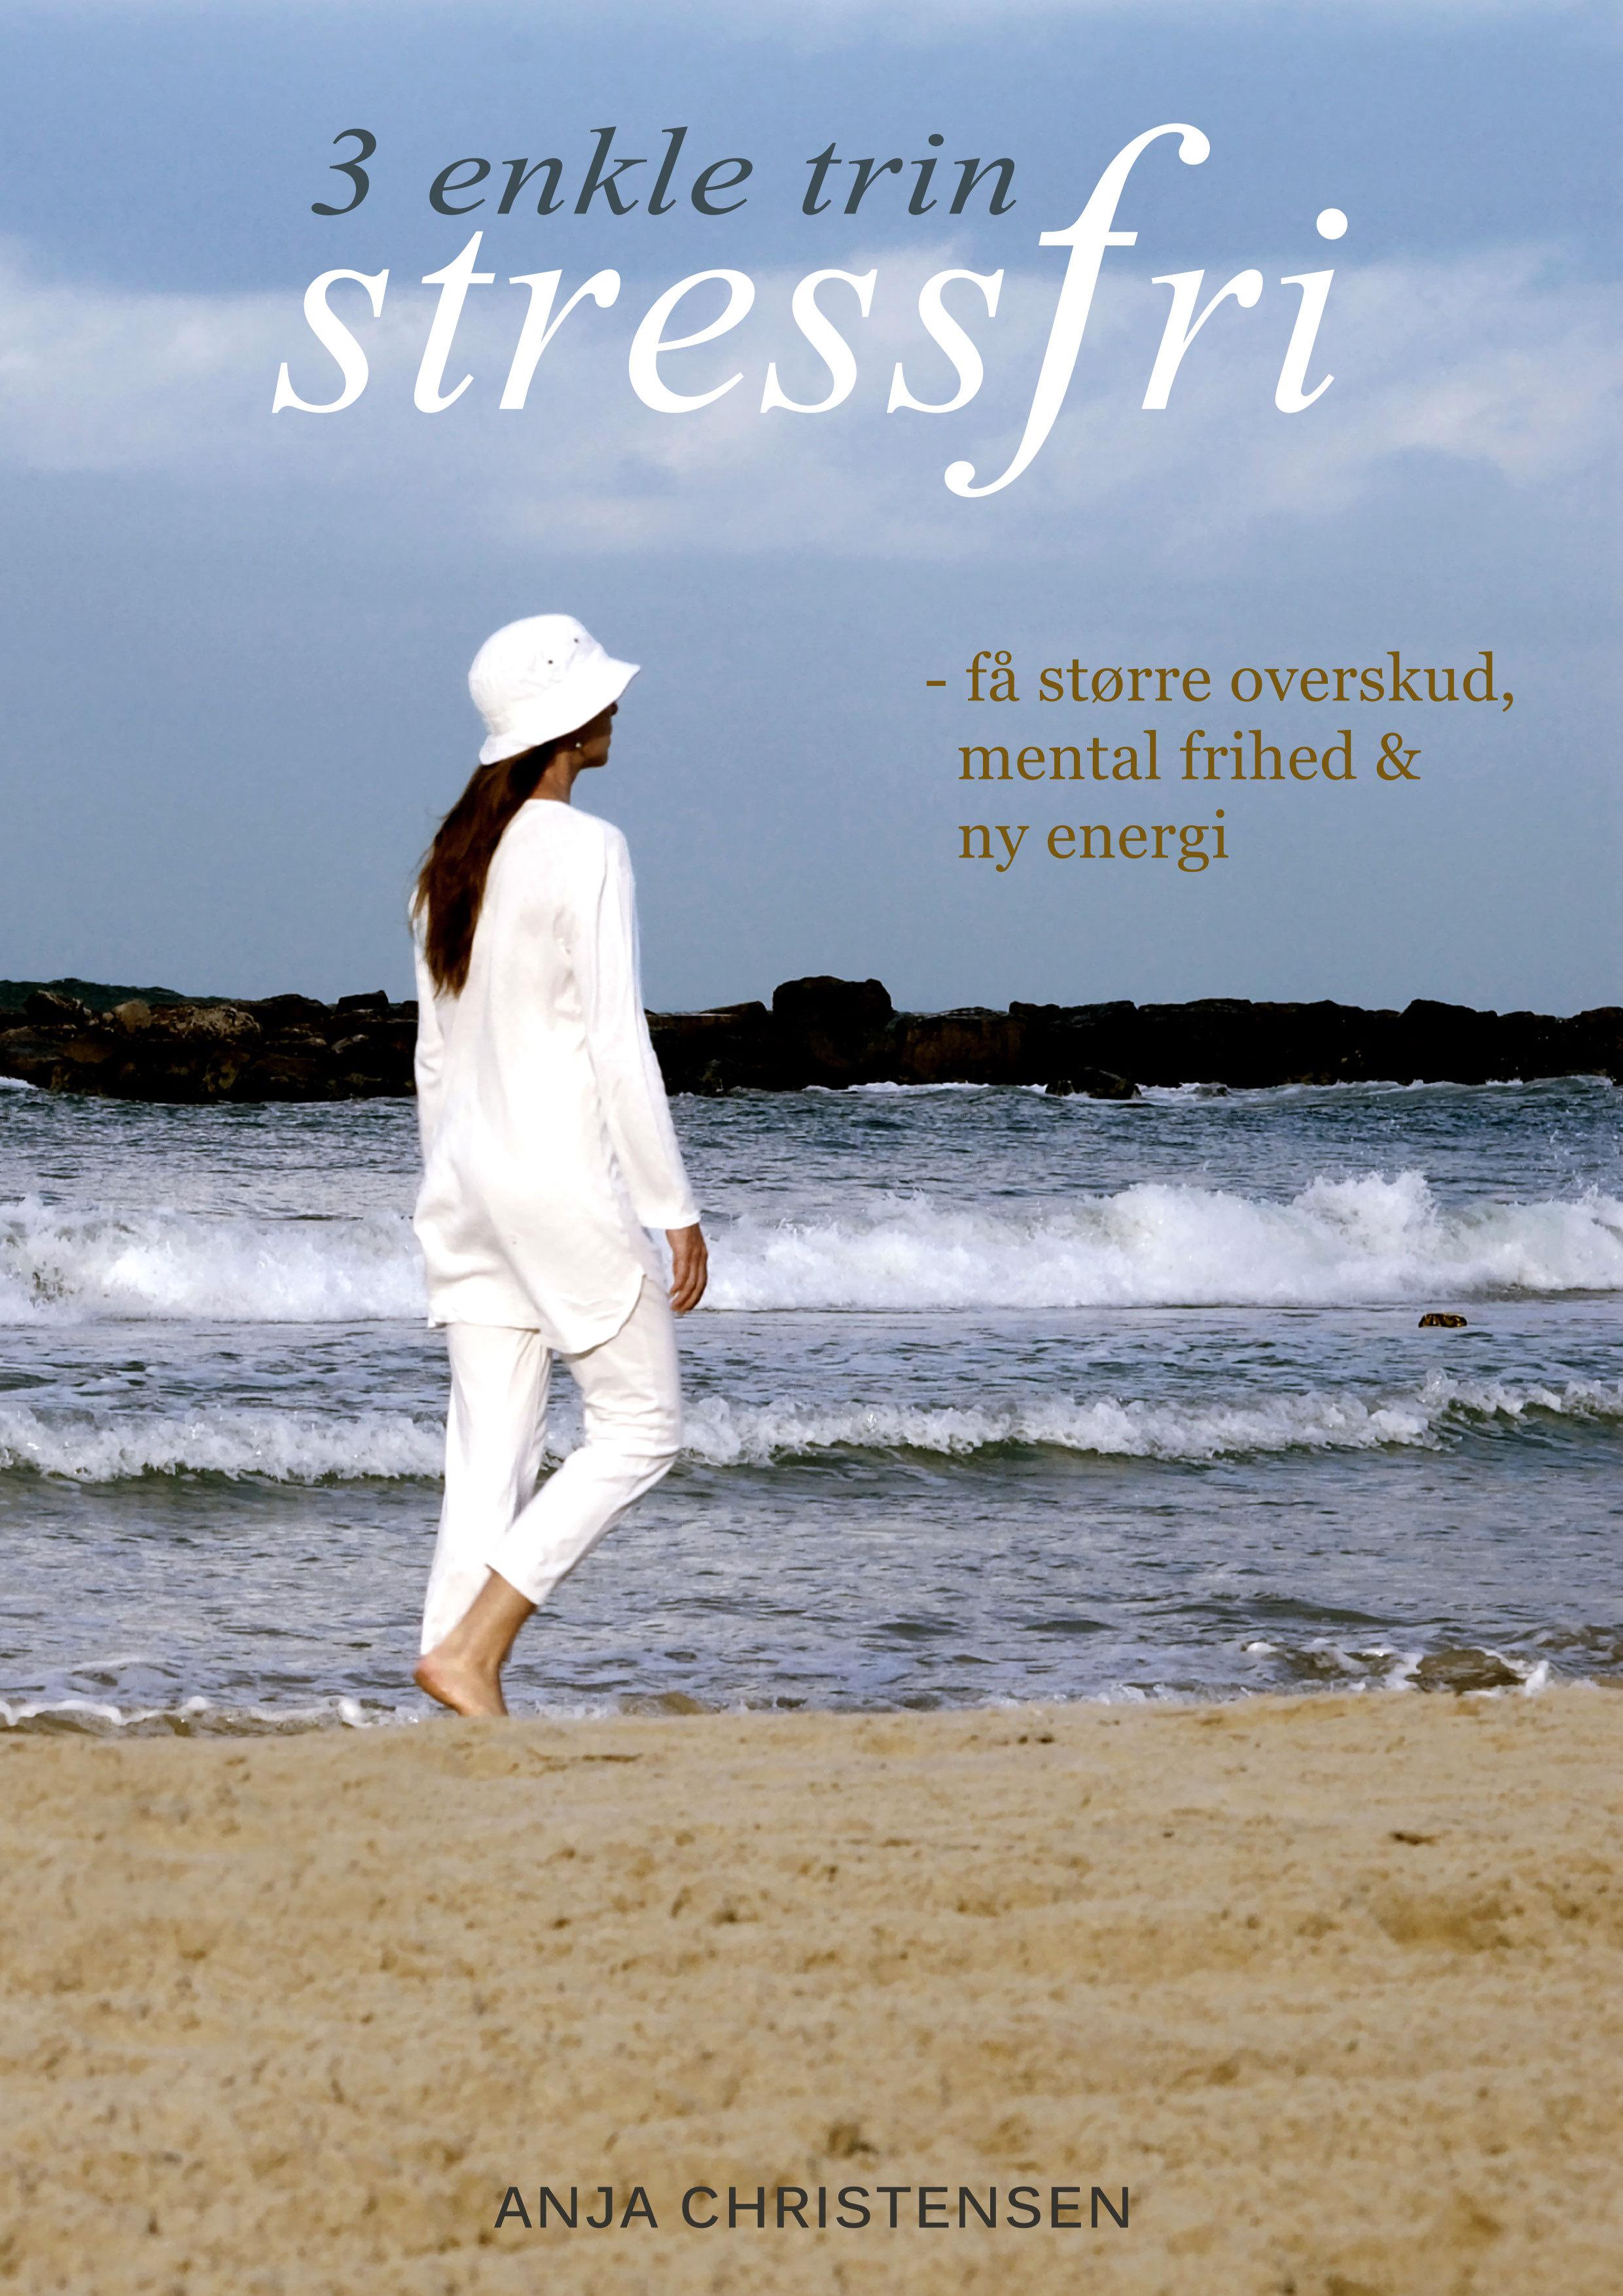 Stressfri - 3 enkle trin Anja Christensen